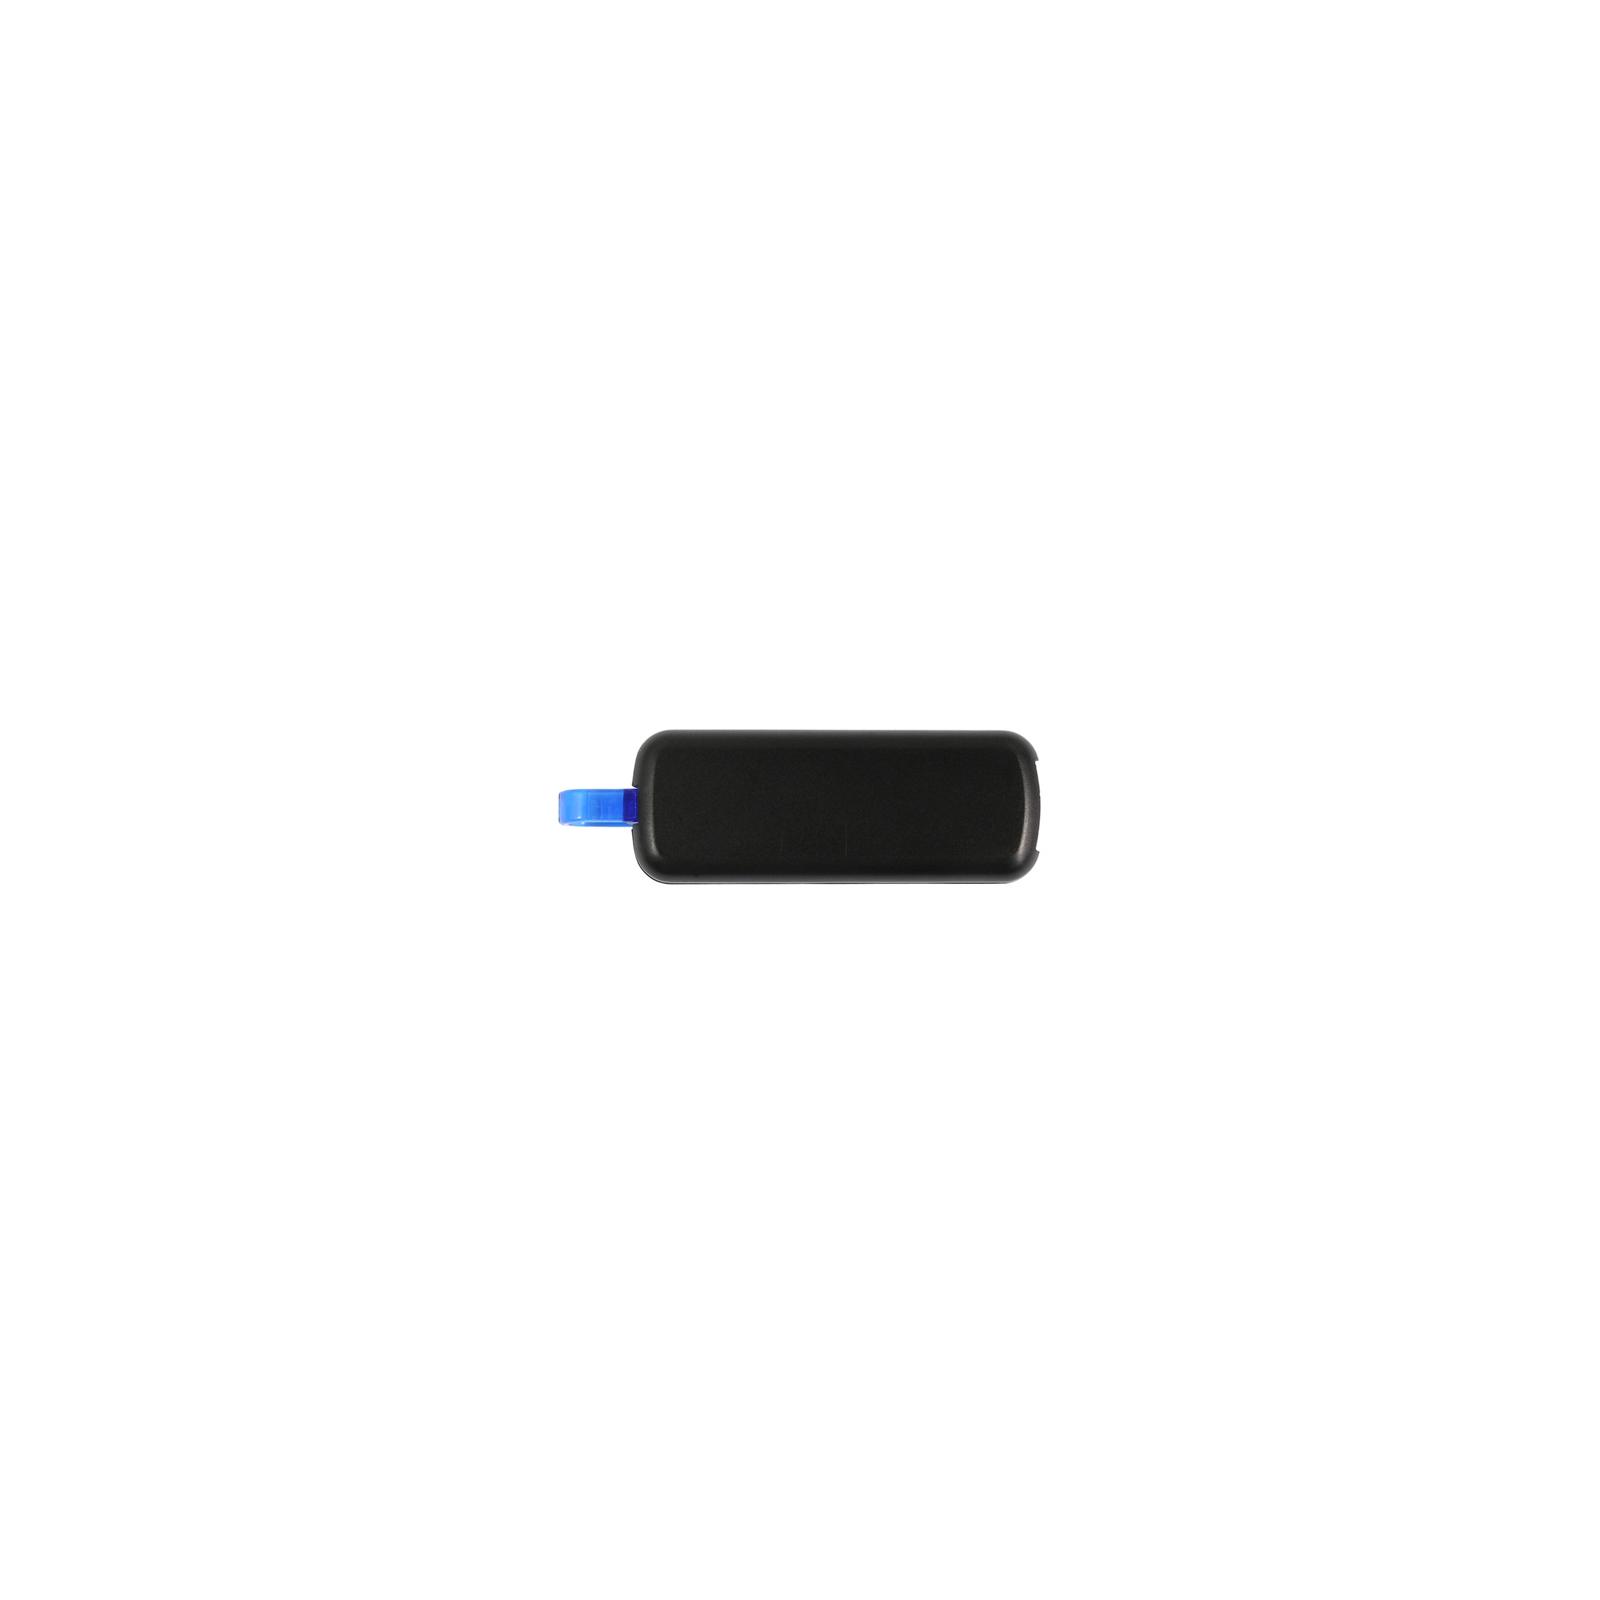 USB флеш накопитель 32GB AH354 Black RP USB3.0 Apacer (AP32GAH354B-1) изображение 2